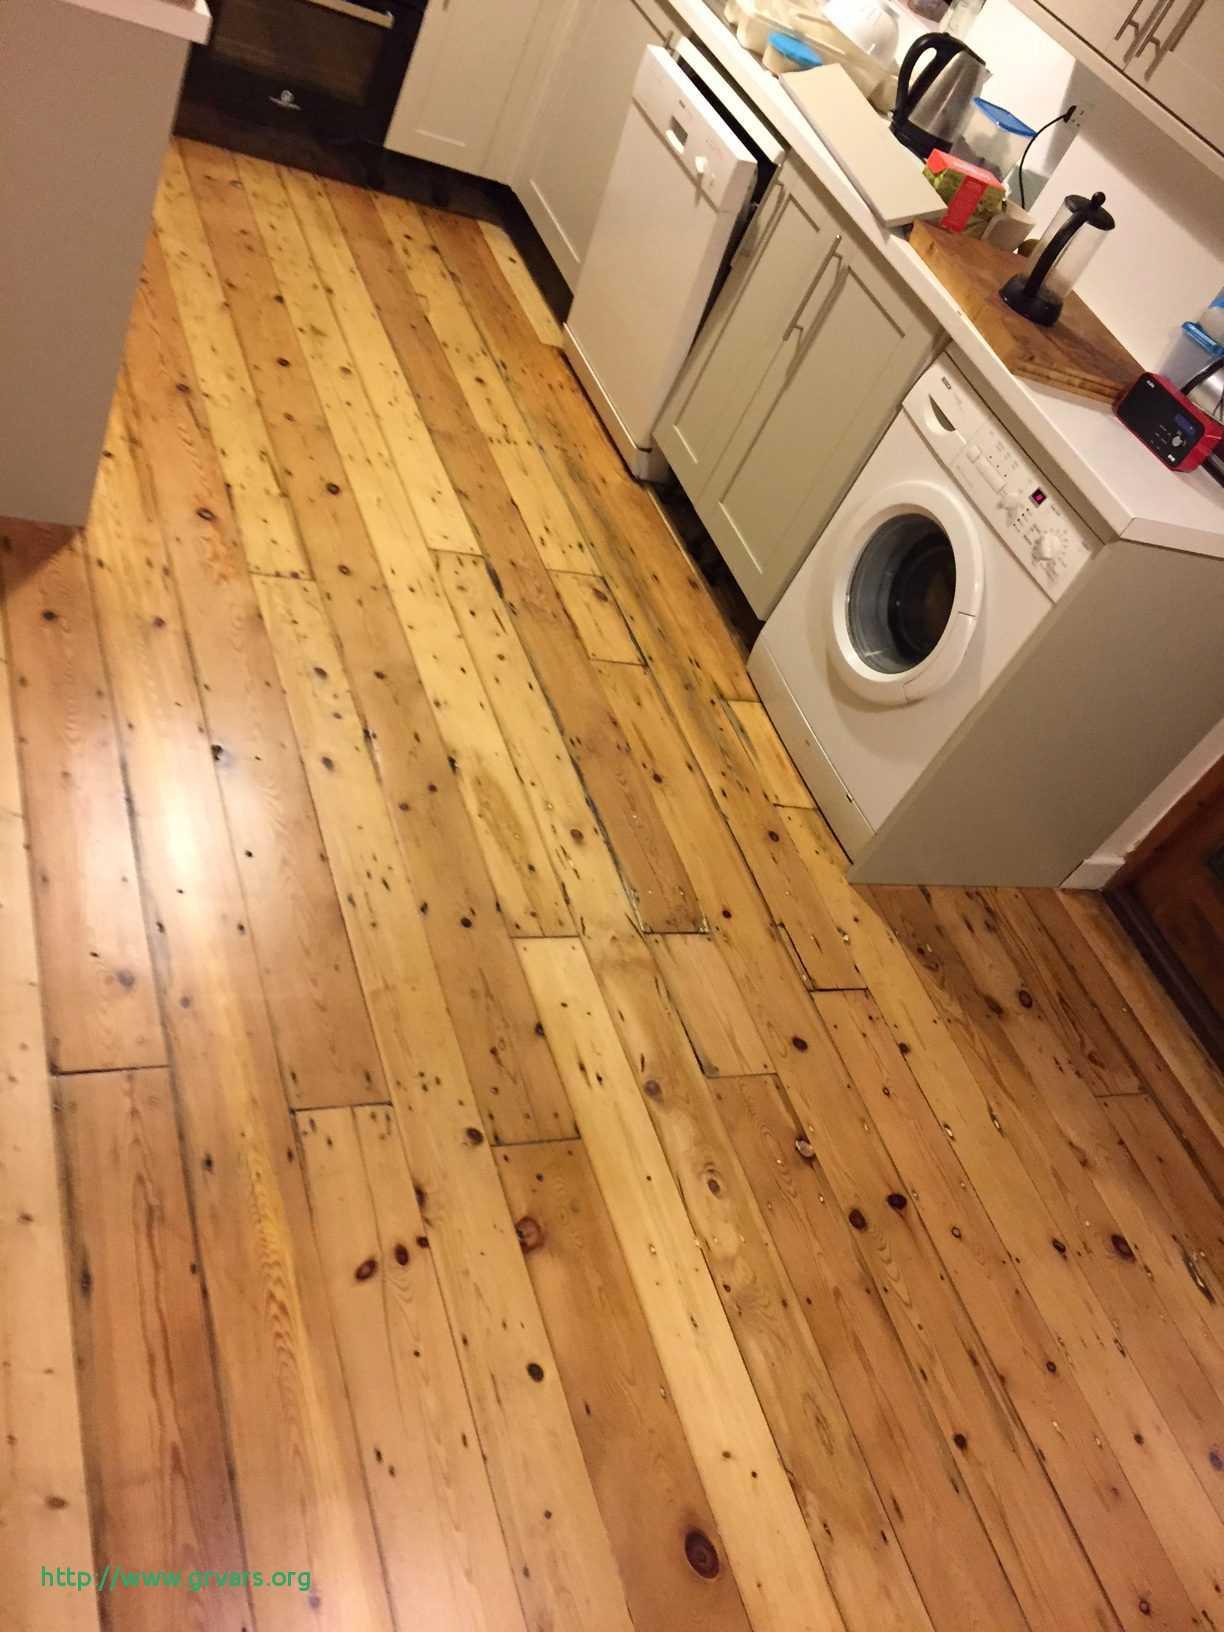 hardwood floor restoration richmond va of can laminate flooring be refinished luxe gallery priory wood floor for can laminate flooring be refinished luxe gallery priory wood floor restoration